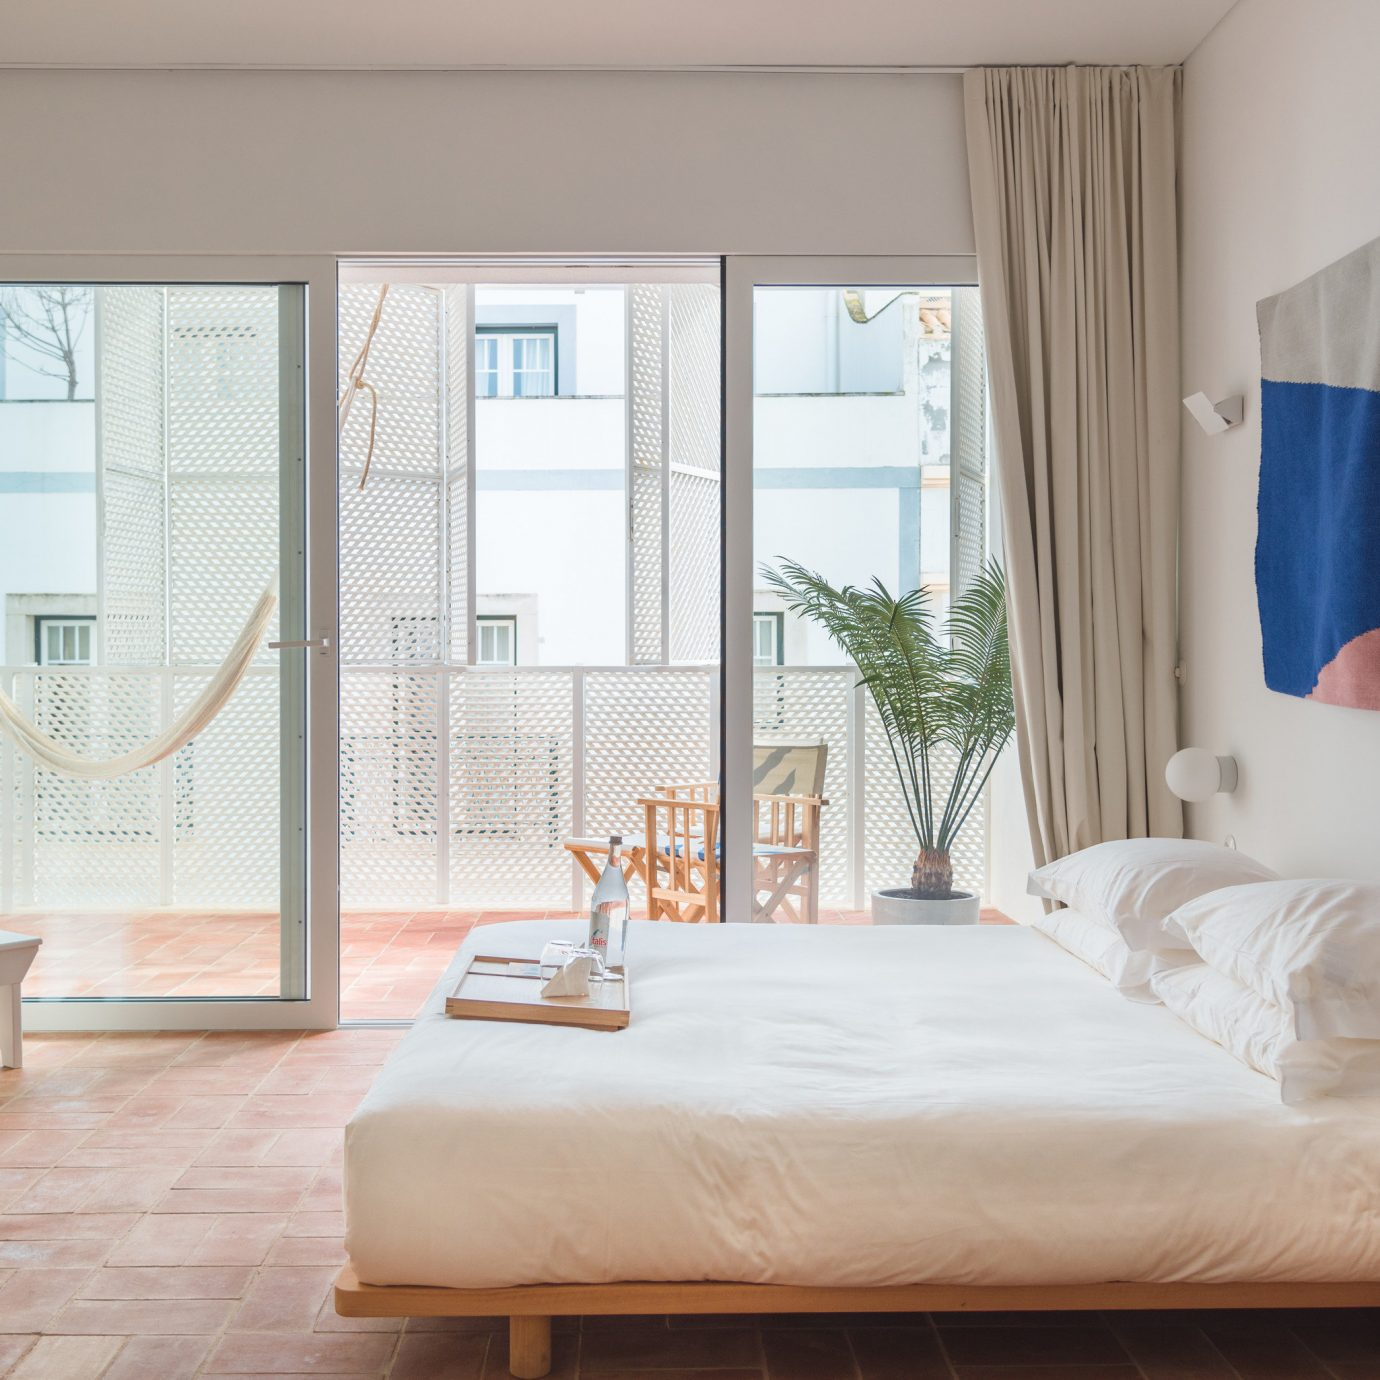 home Bedroom bed frame window treatment curtain textile Suite door mattress bedding product house daylighting window blind interior designer